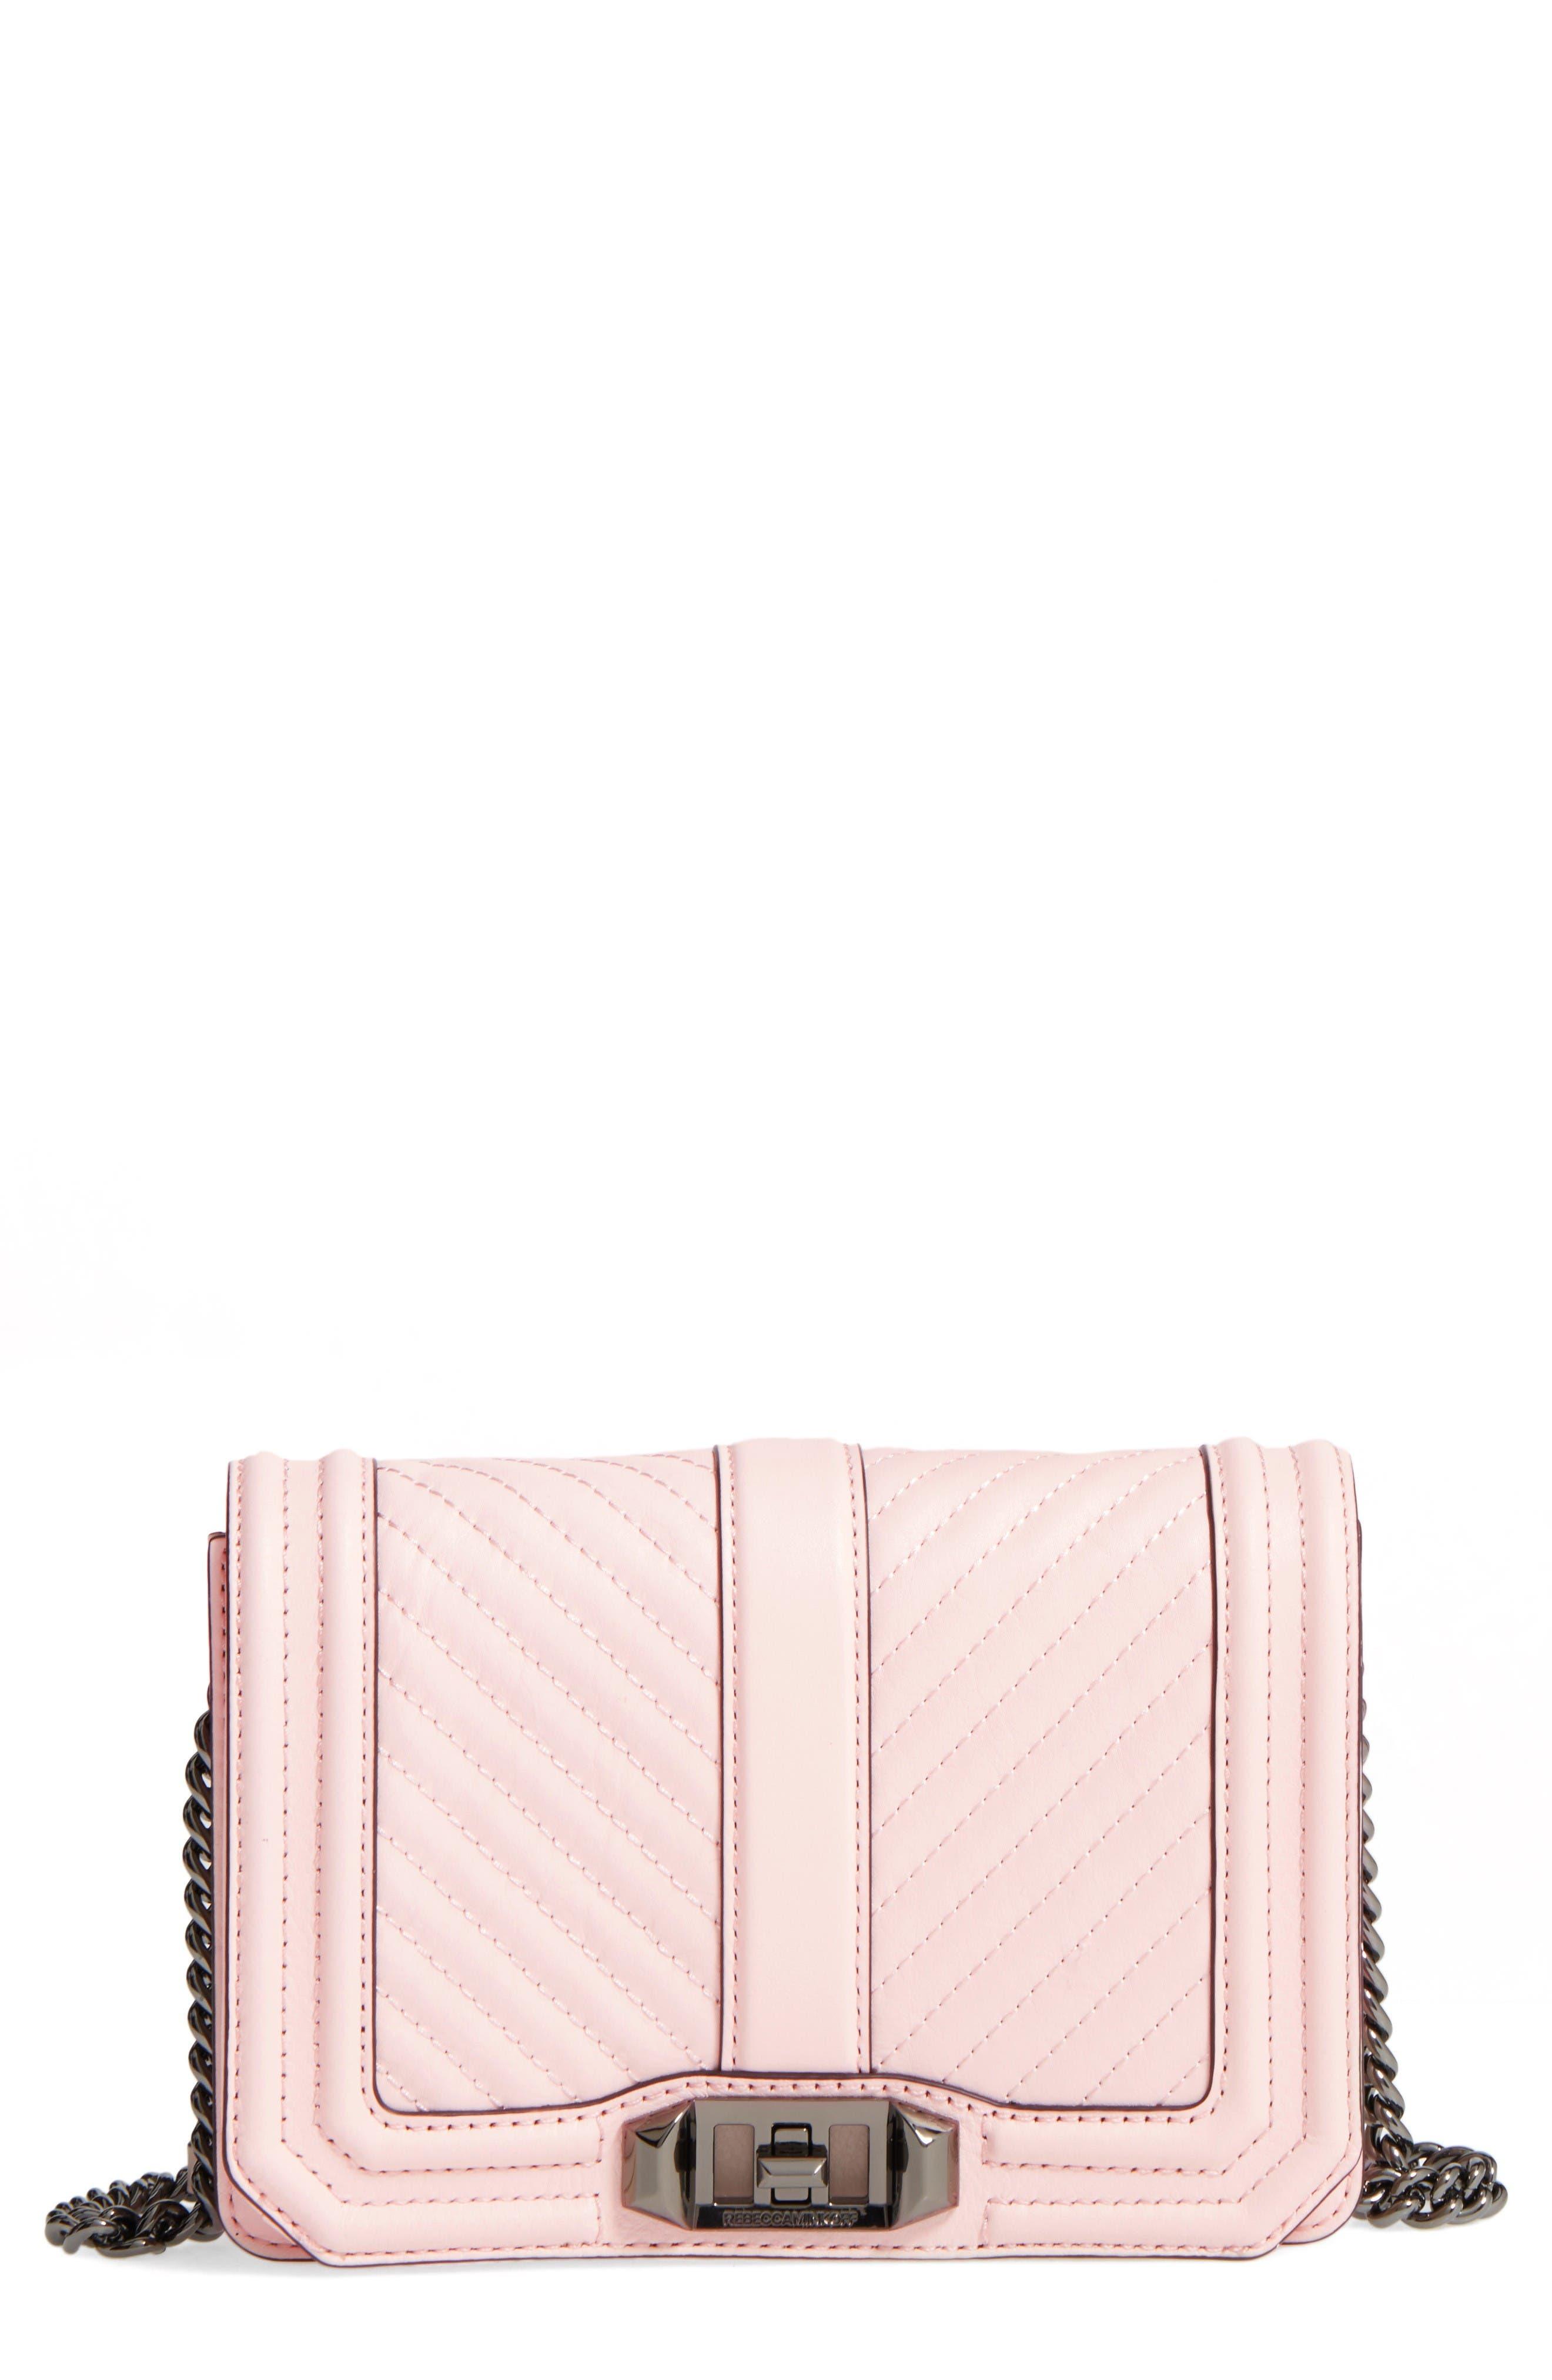 Small Love Leather Crossbody Bag,                             Main thumbnail 1, color,                             Soft Blush/ Gunmetal